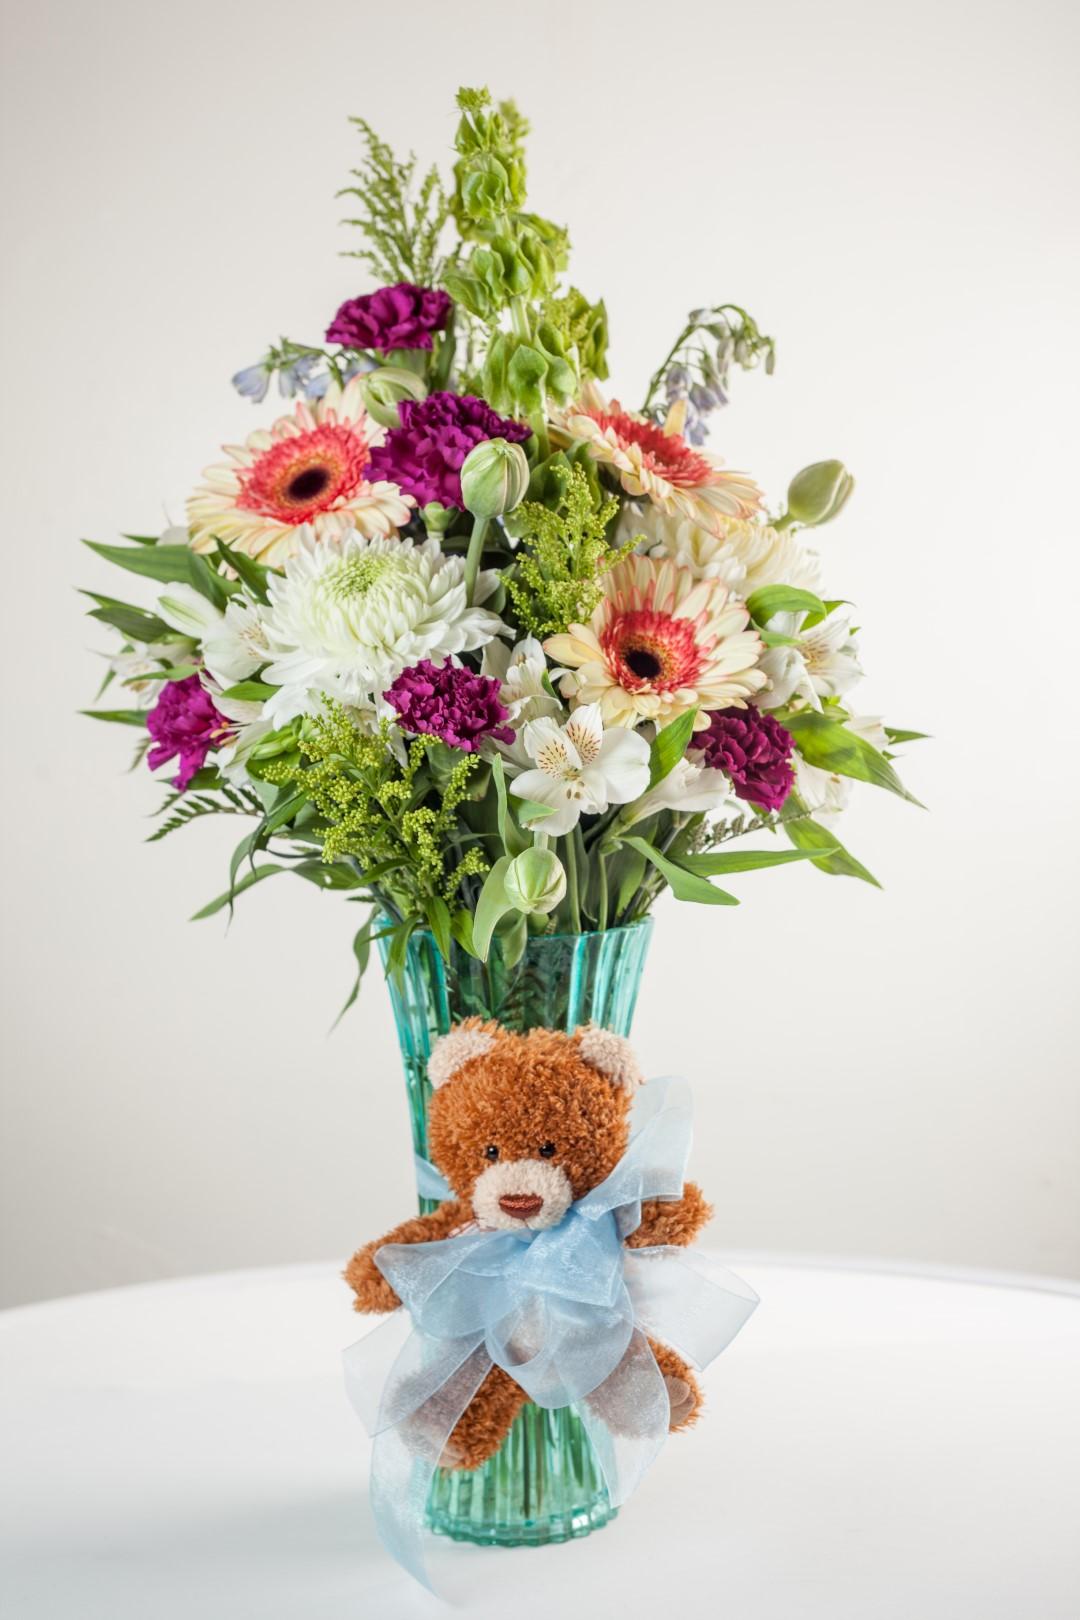 New-Baby_Flowers_Port_Alberni.jpg